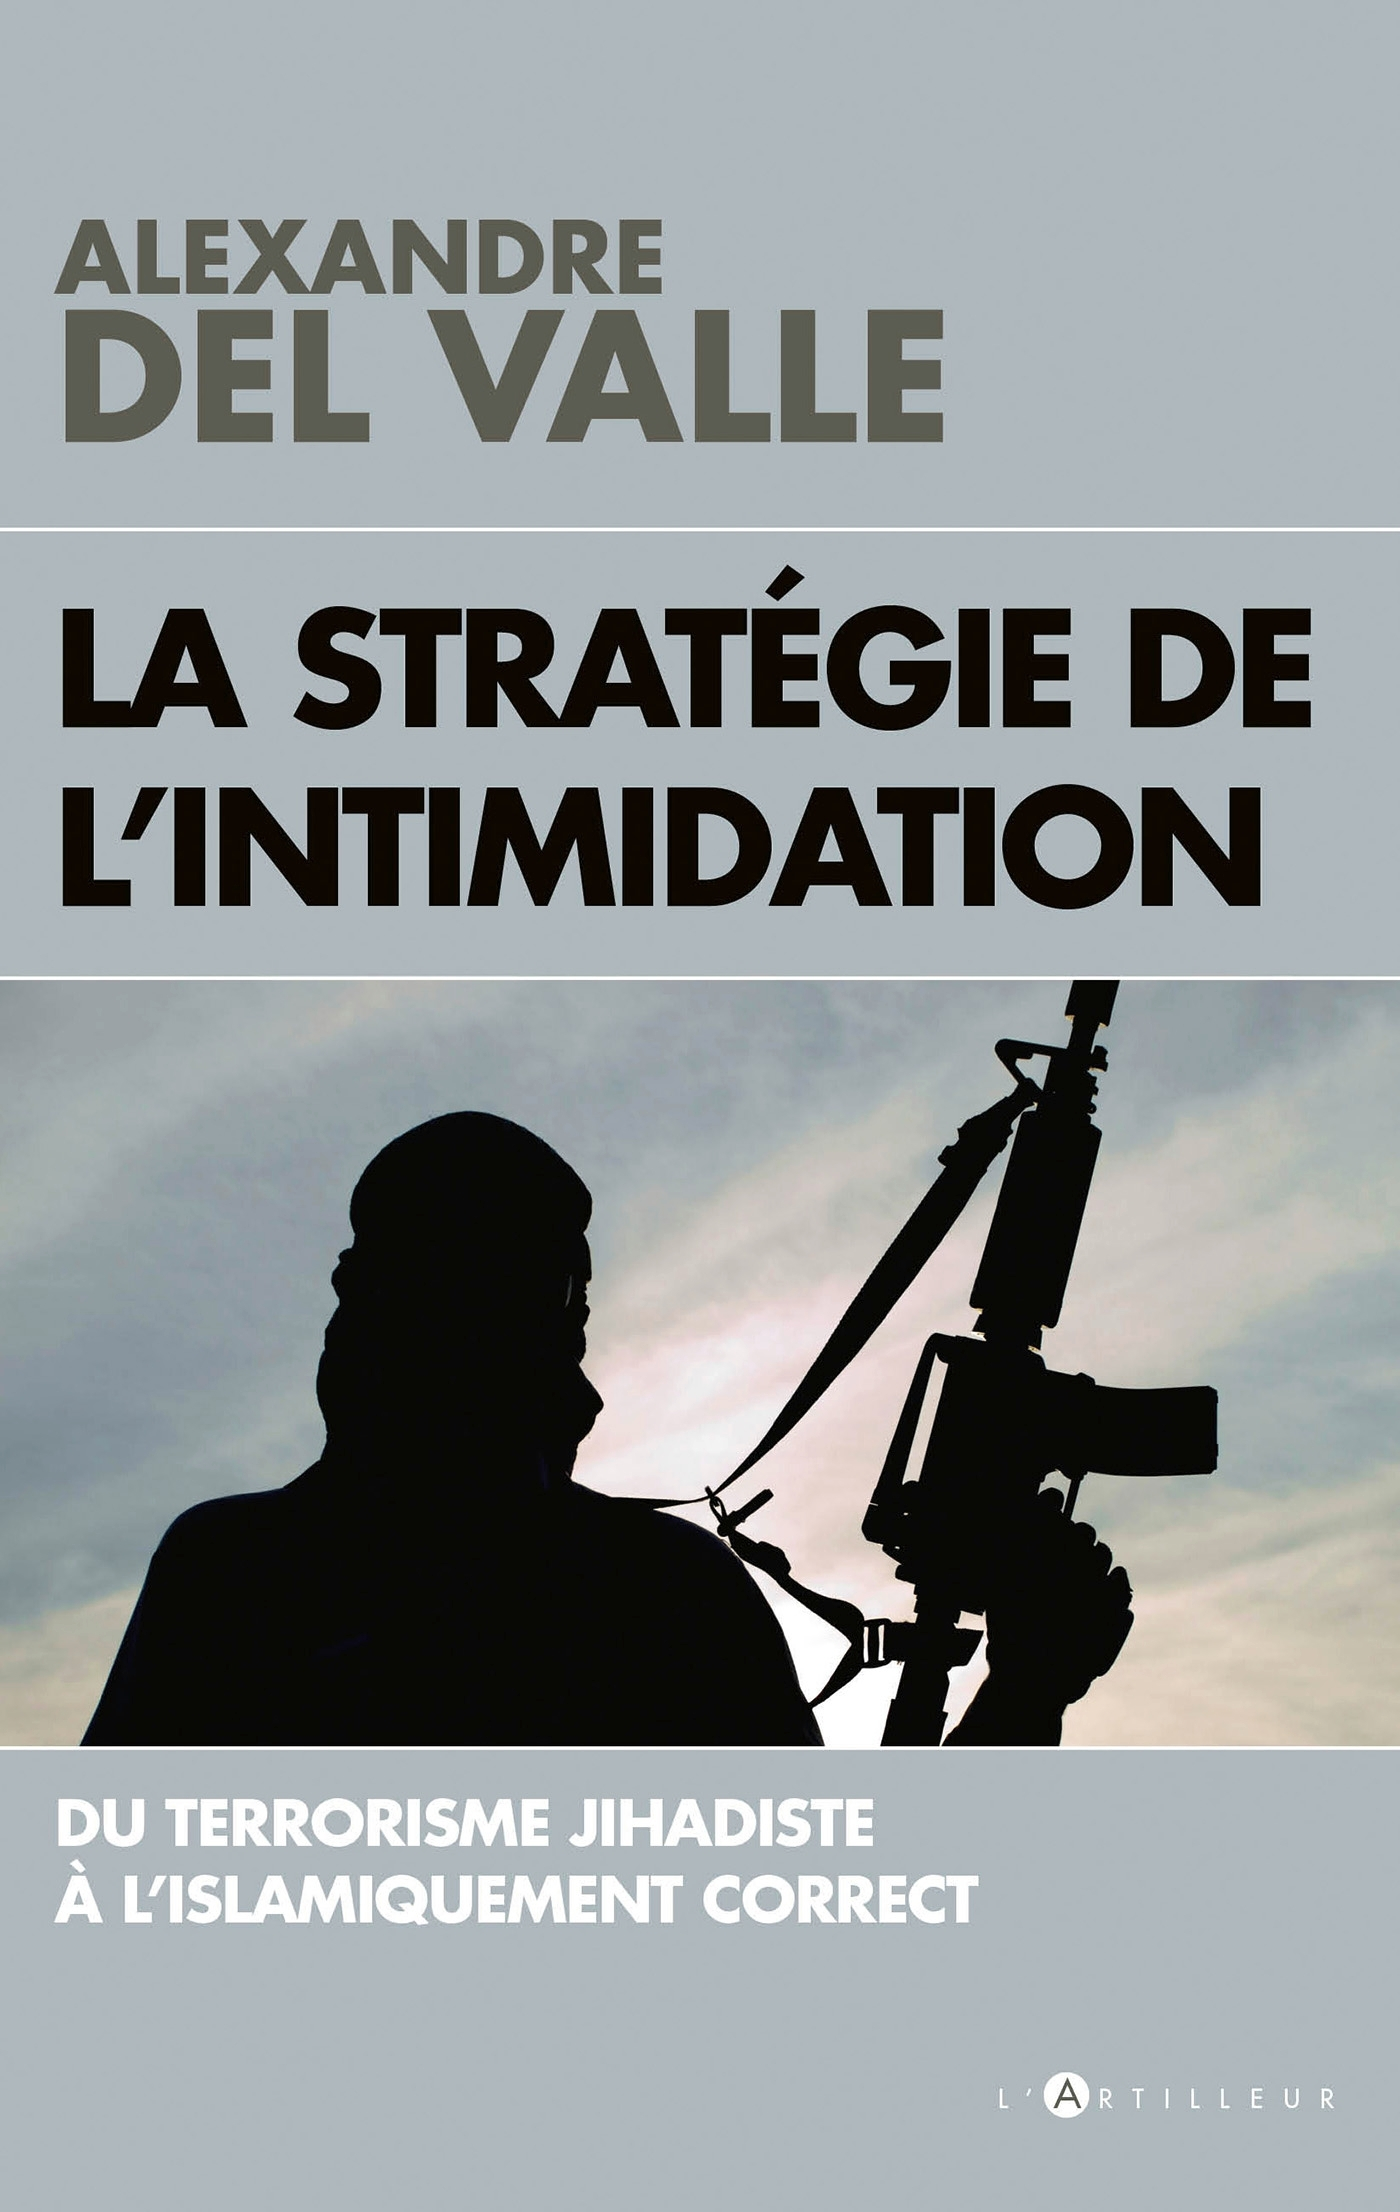 LA STRATEGIE DE L'INTIMIDATION - DU TERRORISME JIHADISTE A L'ISLAMIQUEMENT CORRECT